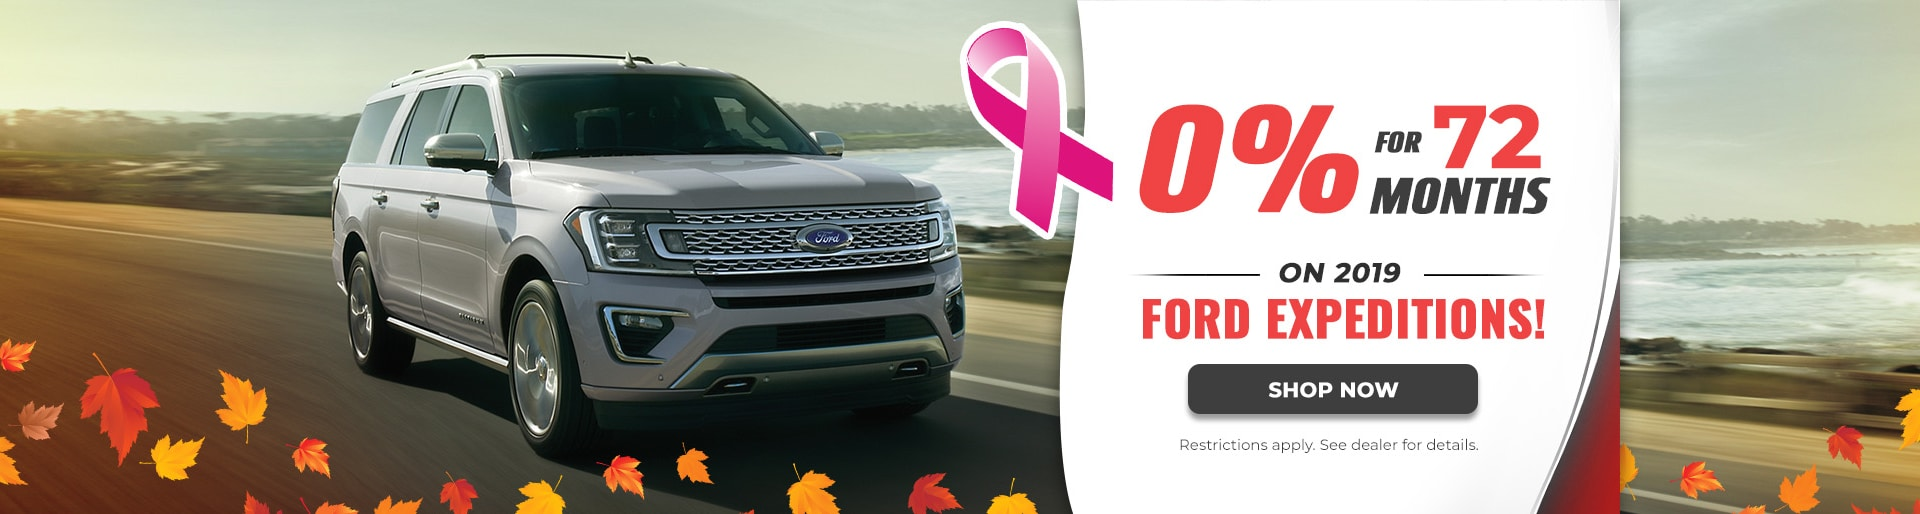 New Used Ford Dealership Woody Folsom Ford In Baxley Ga